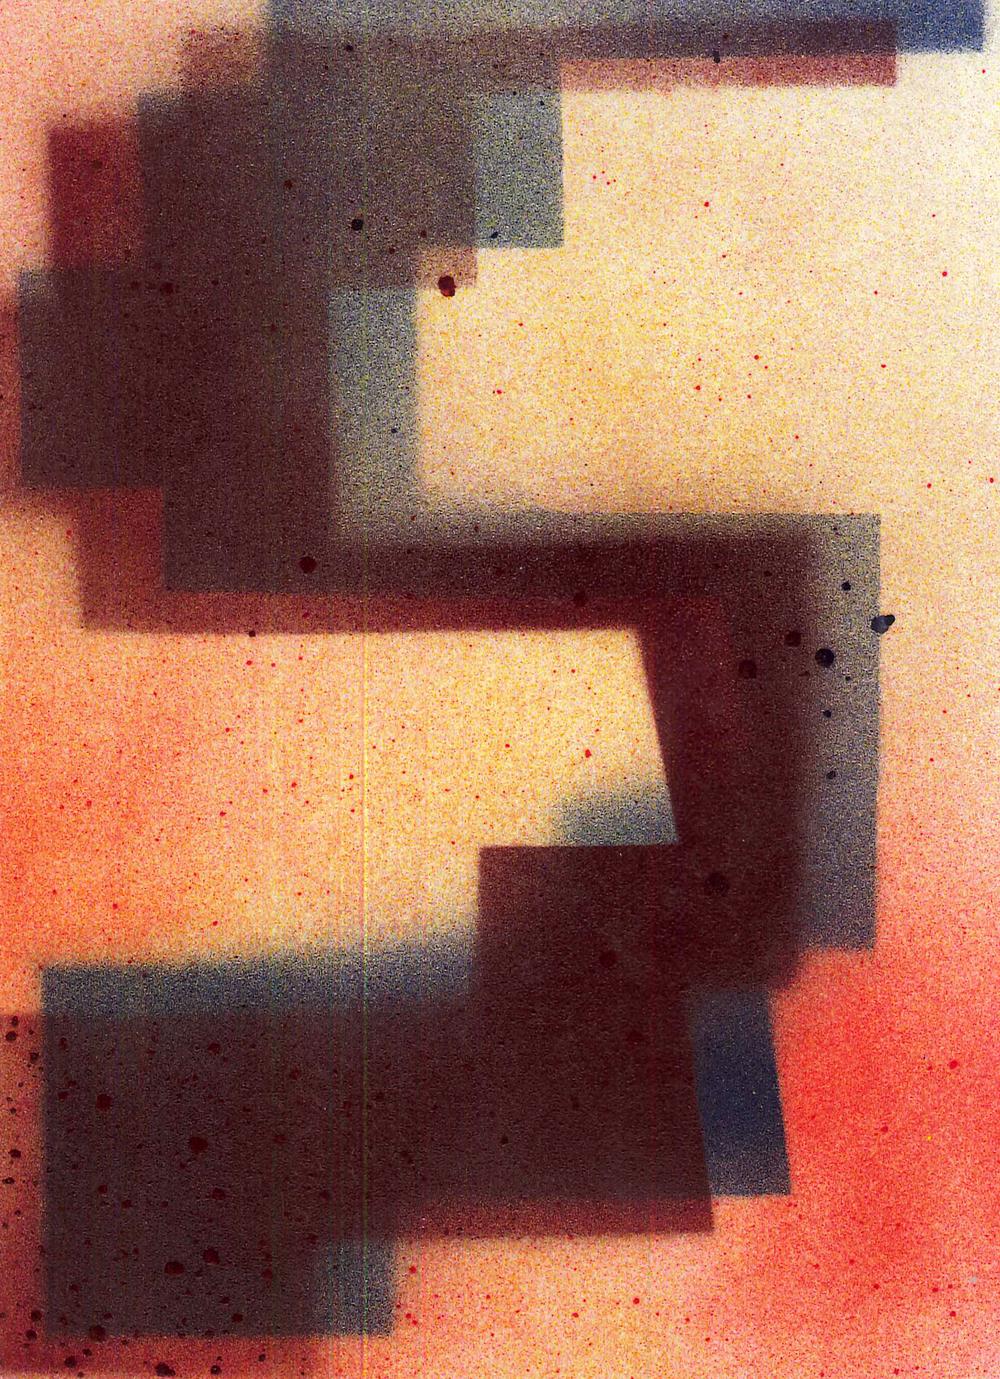 'S5', 2015, spray paint on cartridge paper, 15 x 21 cm